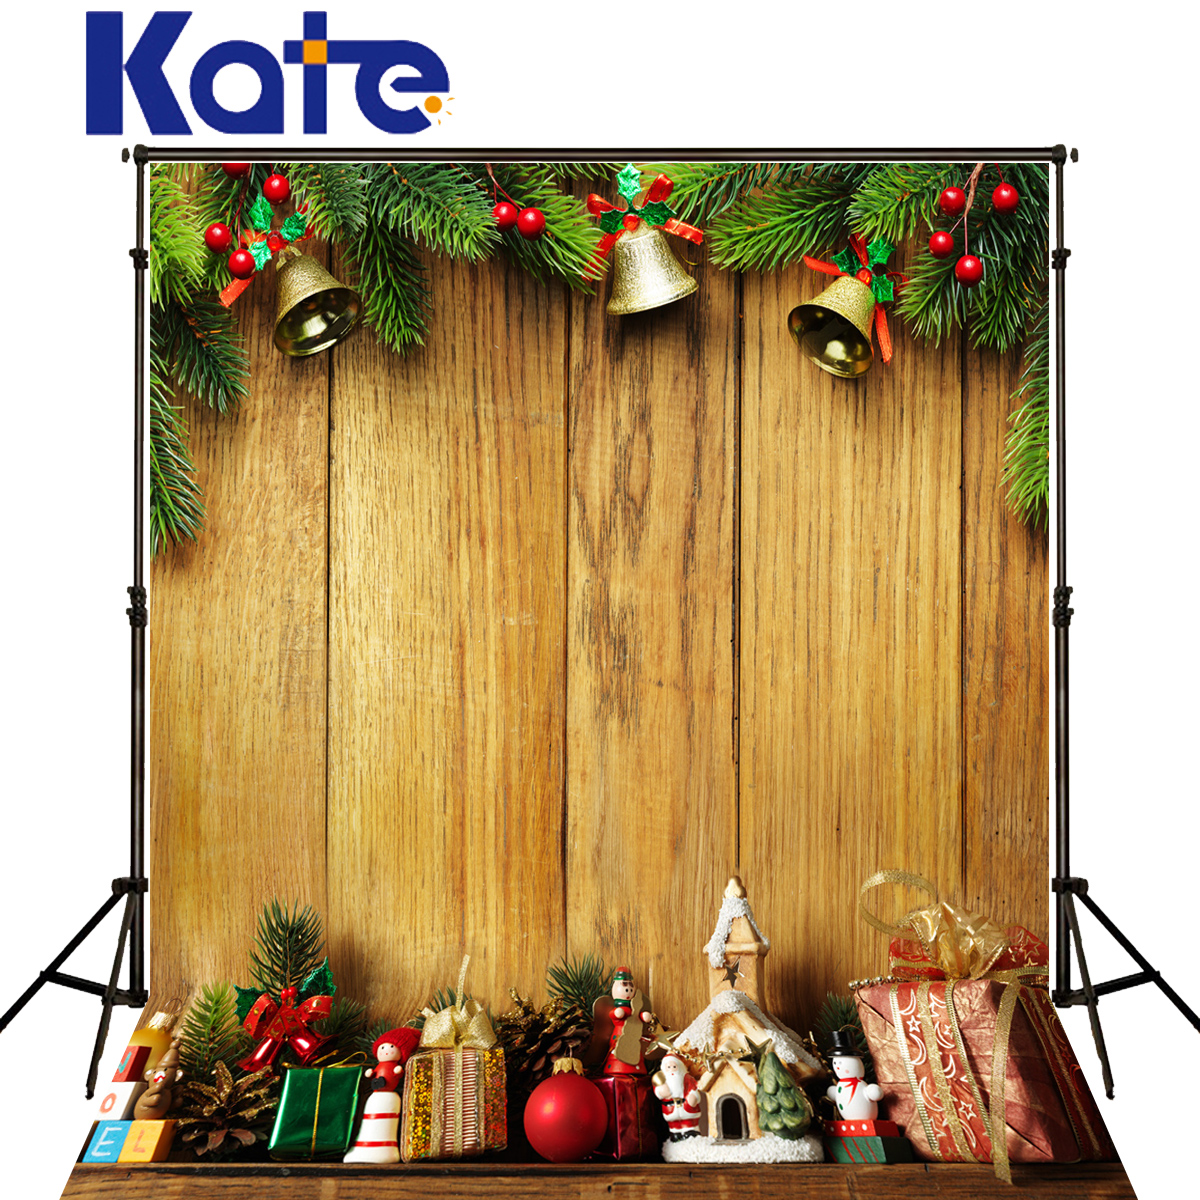 Kate Christmas Photography Backdrops Gold Bell Toy Fondo Fotografico De Estudio Yellow Wood Floor Fundo Fotografico Natal<br>